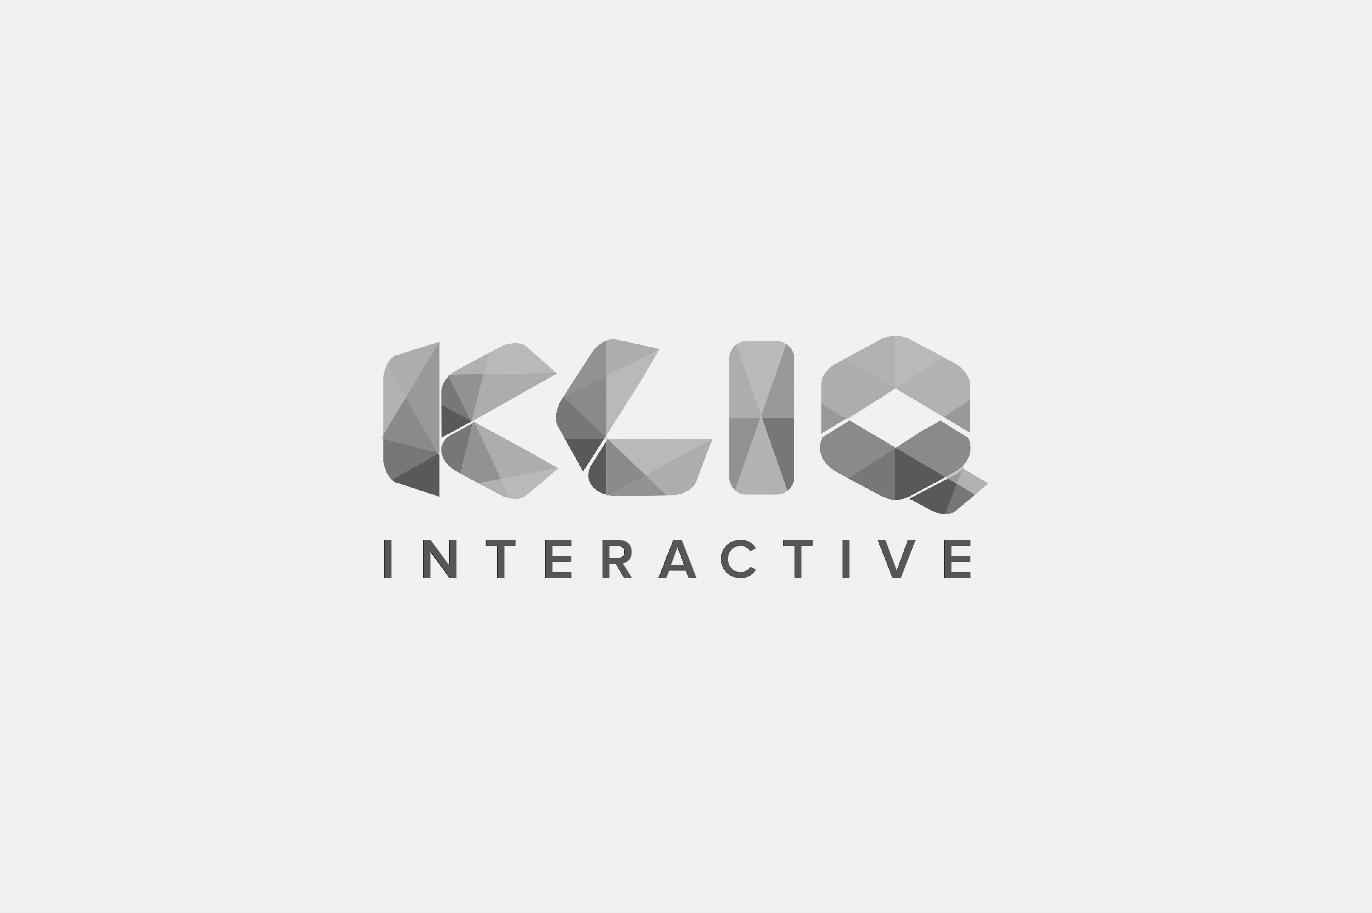 KLIQ-Interactive-Branding-Logo-Designs.jpg